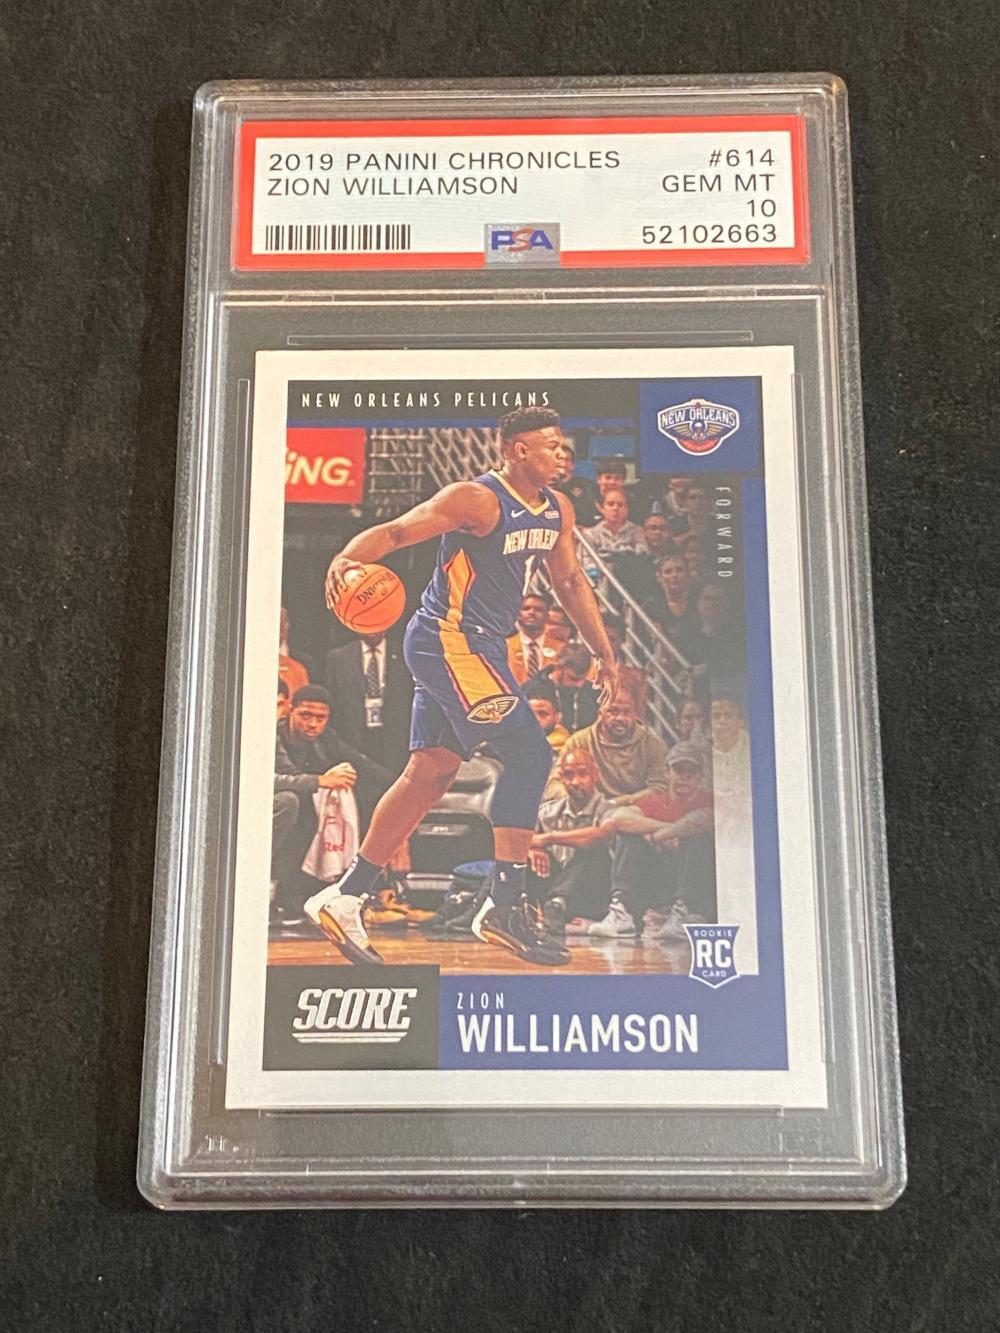 PSA 10 (Gem Mint) 2019-20 Panini Chronicles RC Zion Williamson Rookie #614 Basketball Card